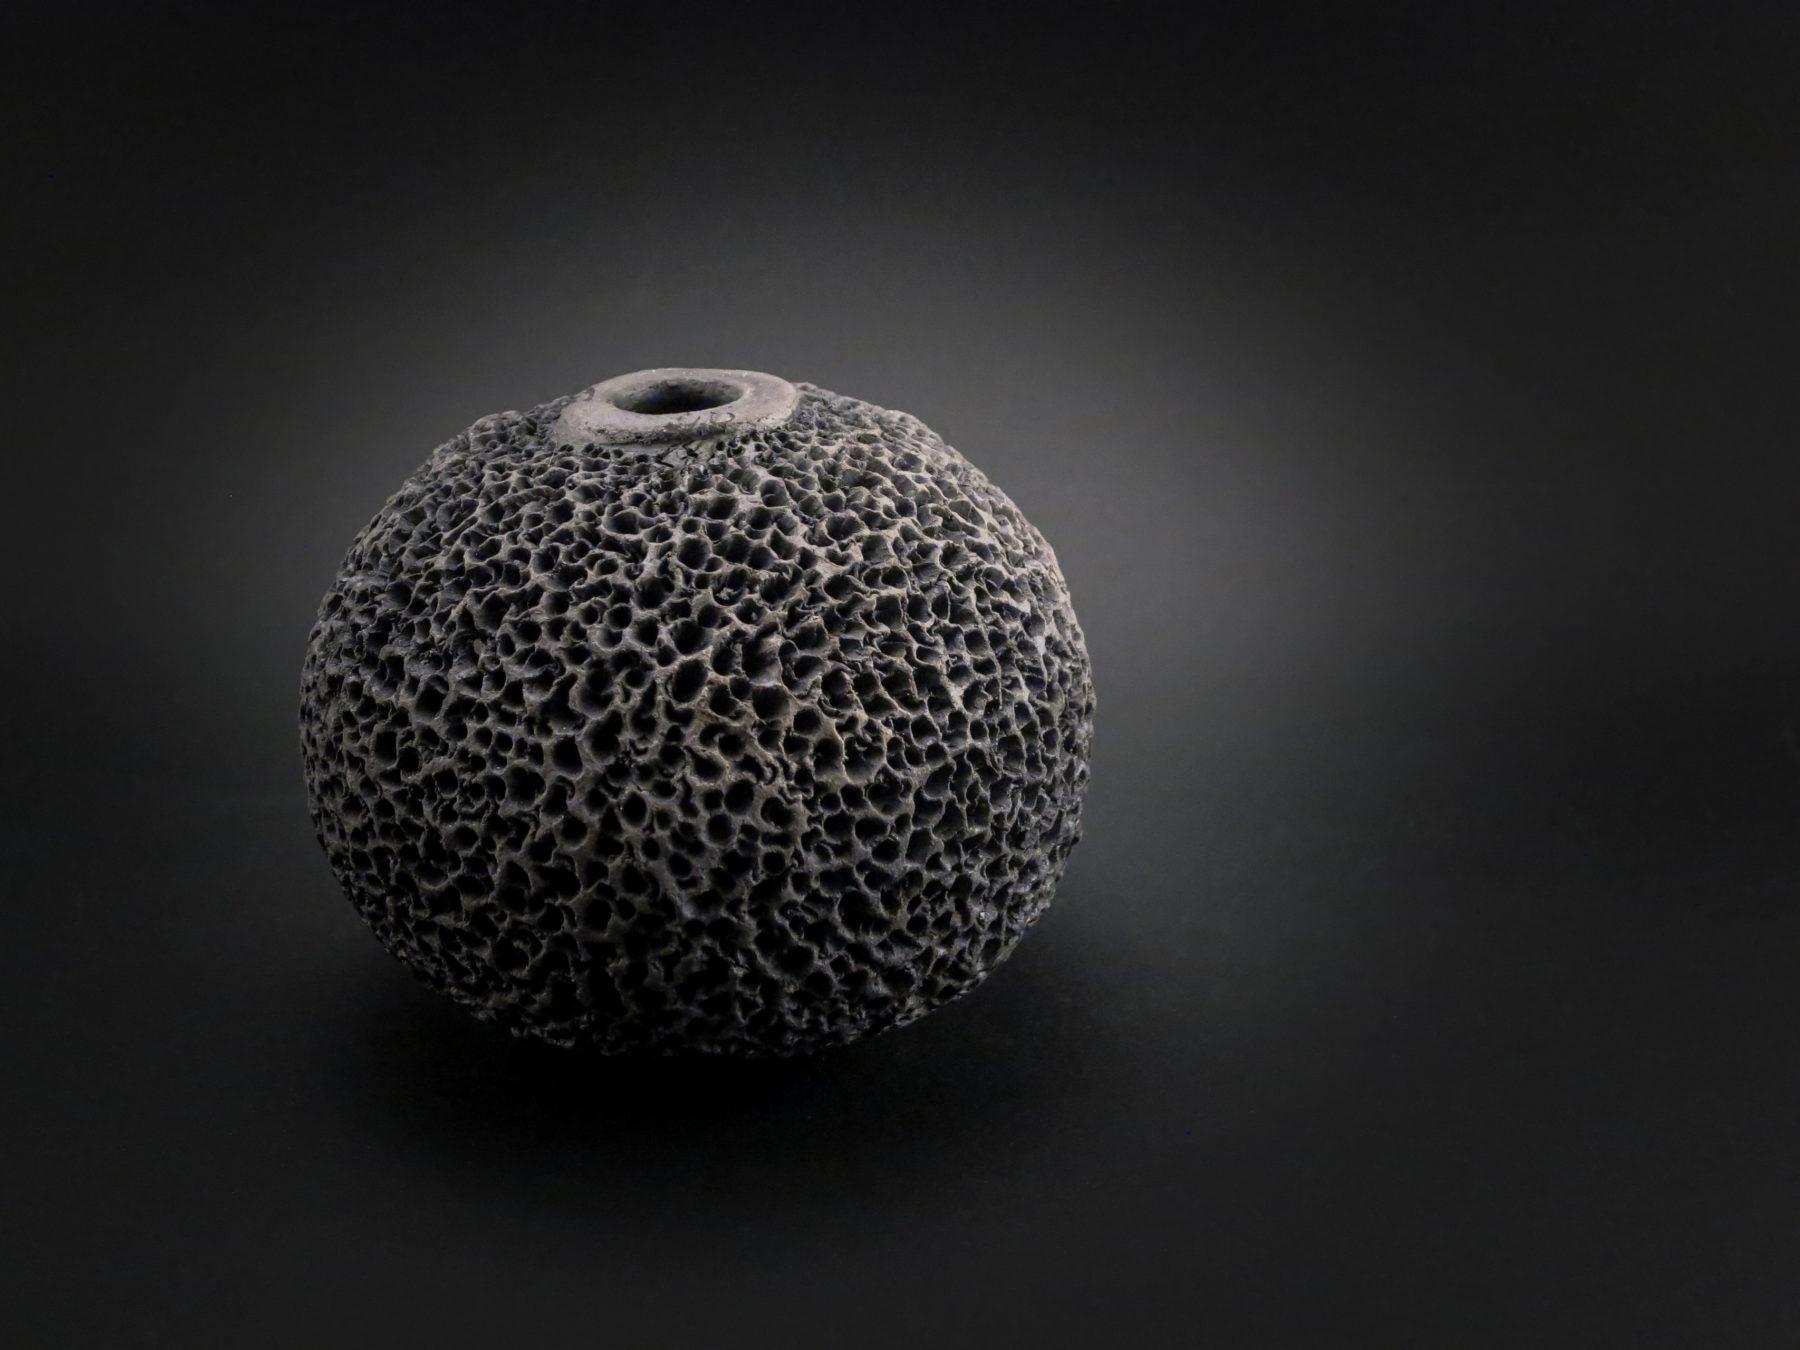 Black Sponge: Whispering Globe - Ildikó Károlyi